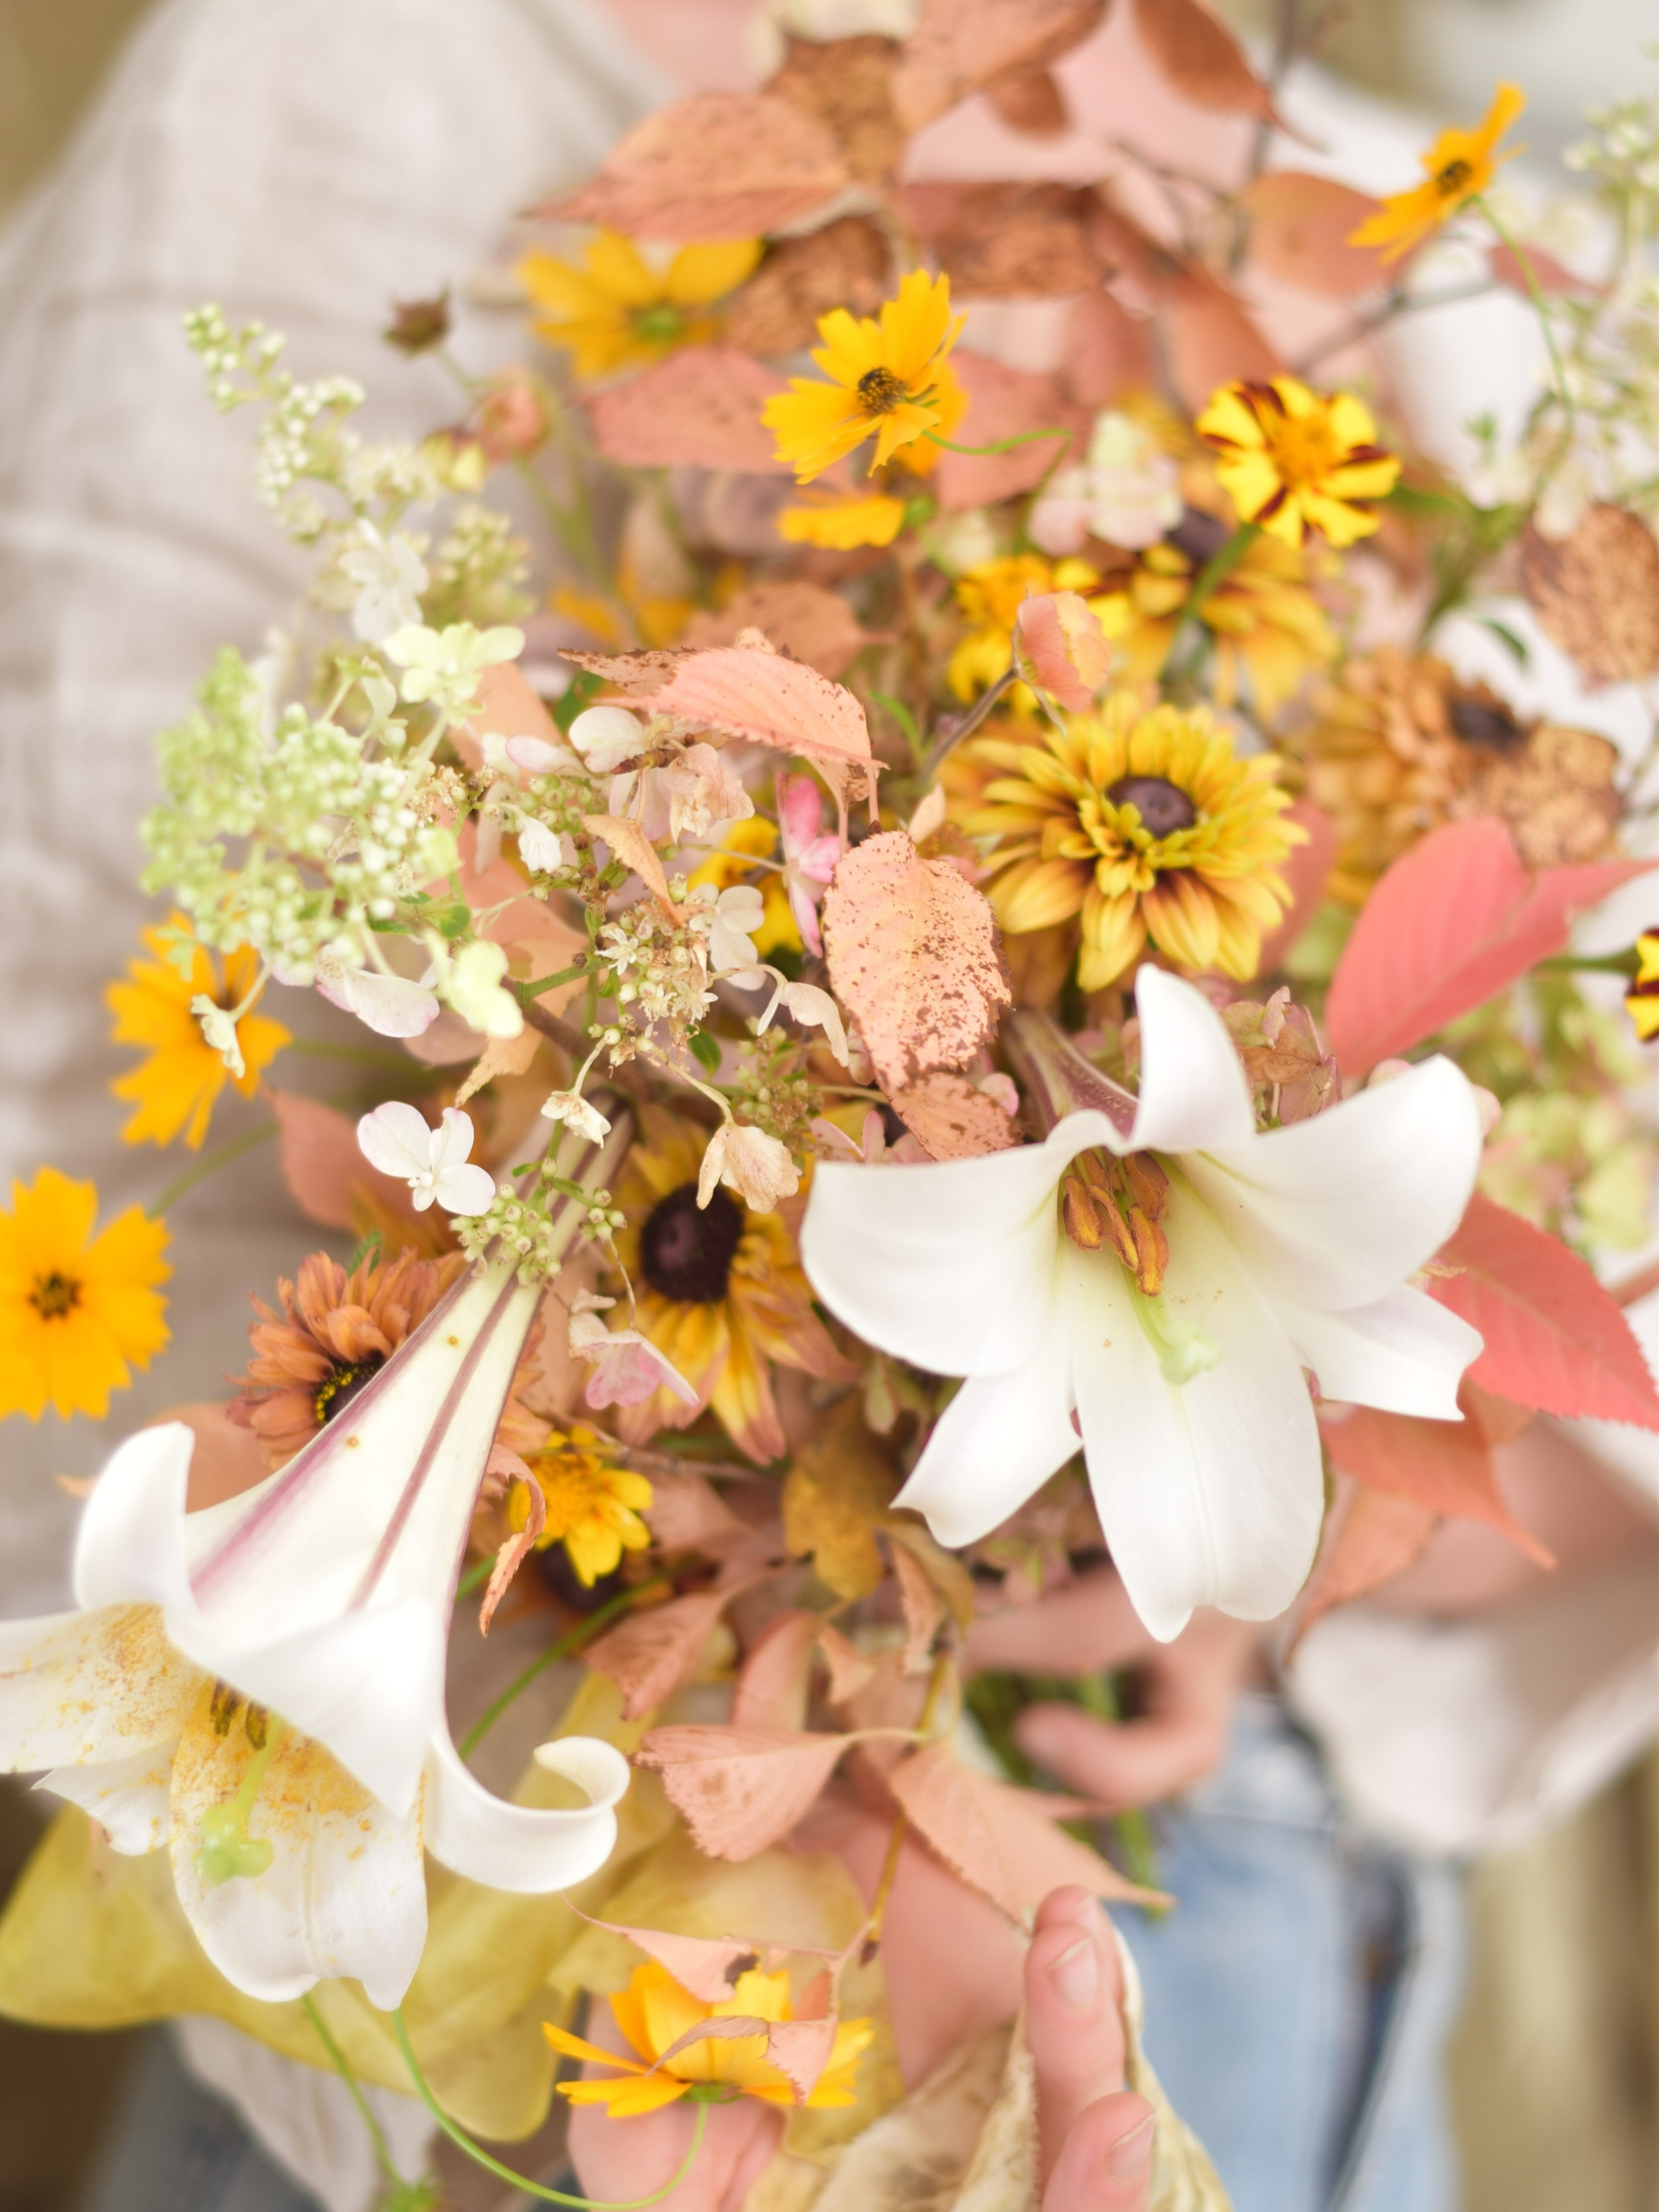 Alice+Beasley+flowers+summer+bridal+bouquet